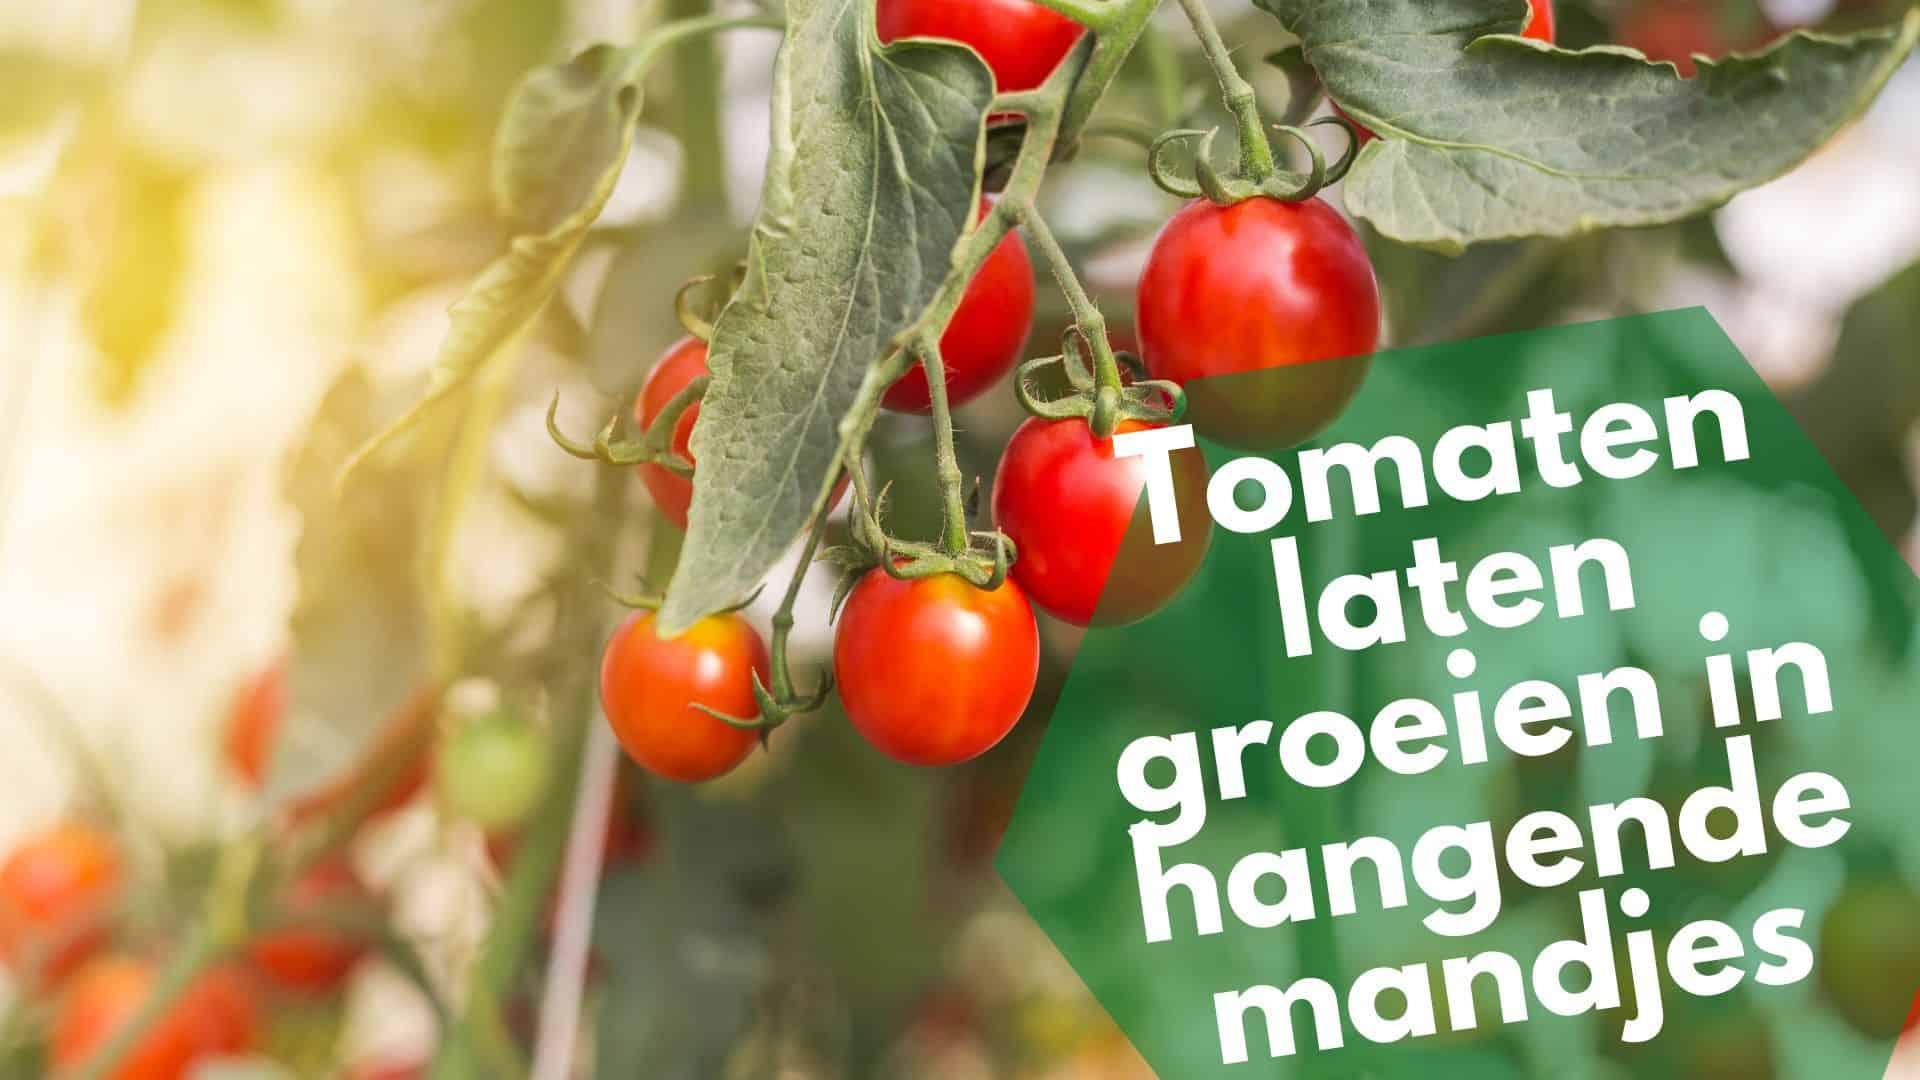 Tomaten binnen laten groeien in hangende mandjes: urban gardening